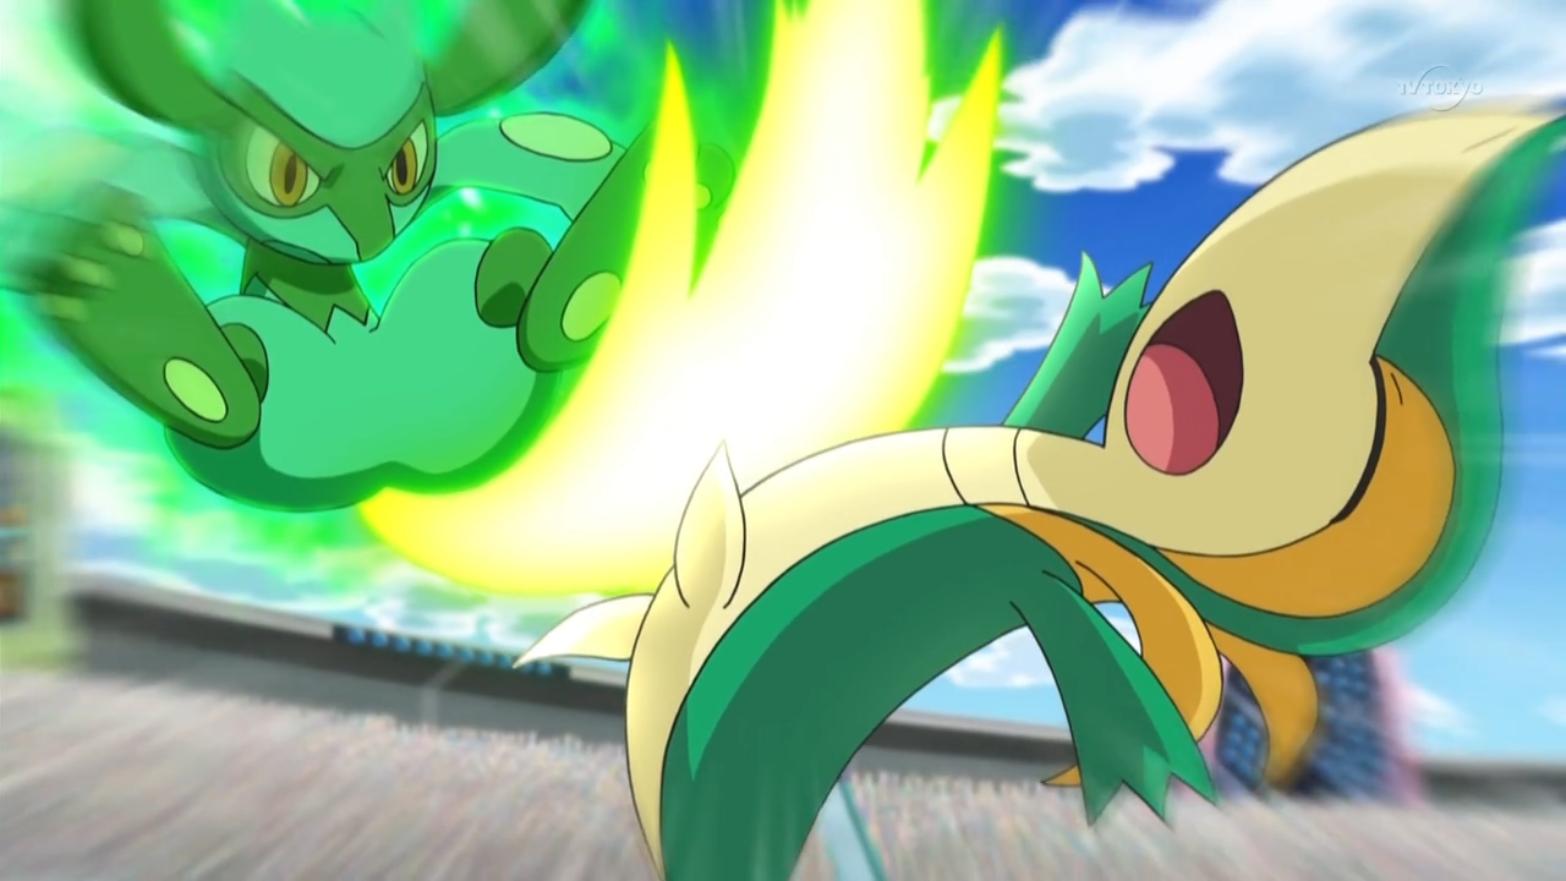 Blade Pokemon x Blade.png The Pokémon